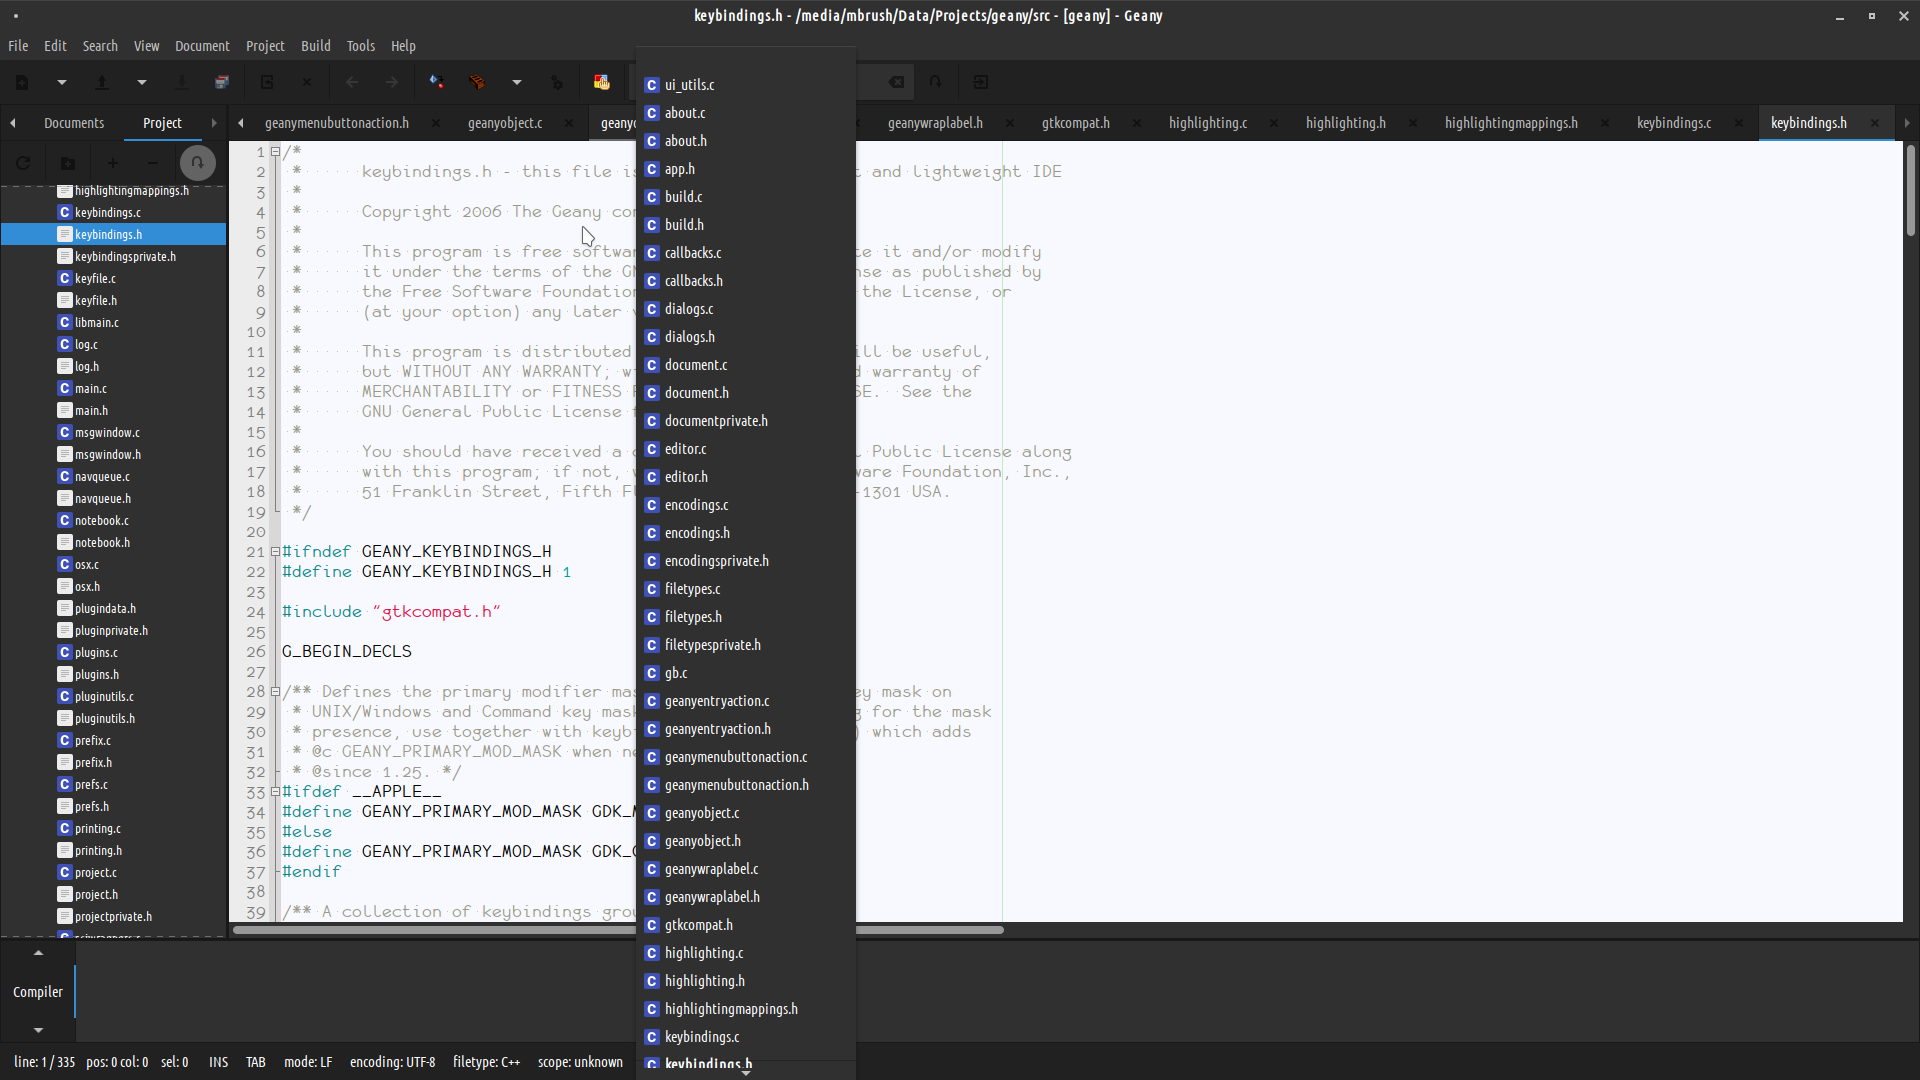 geany_tab_menu